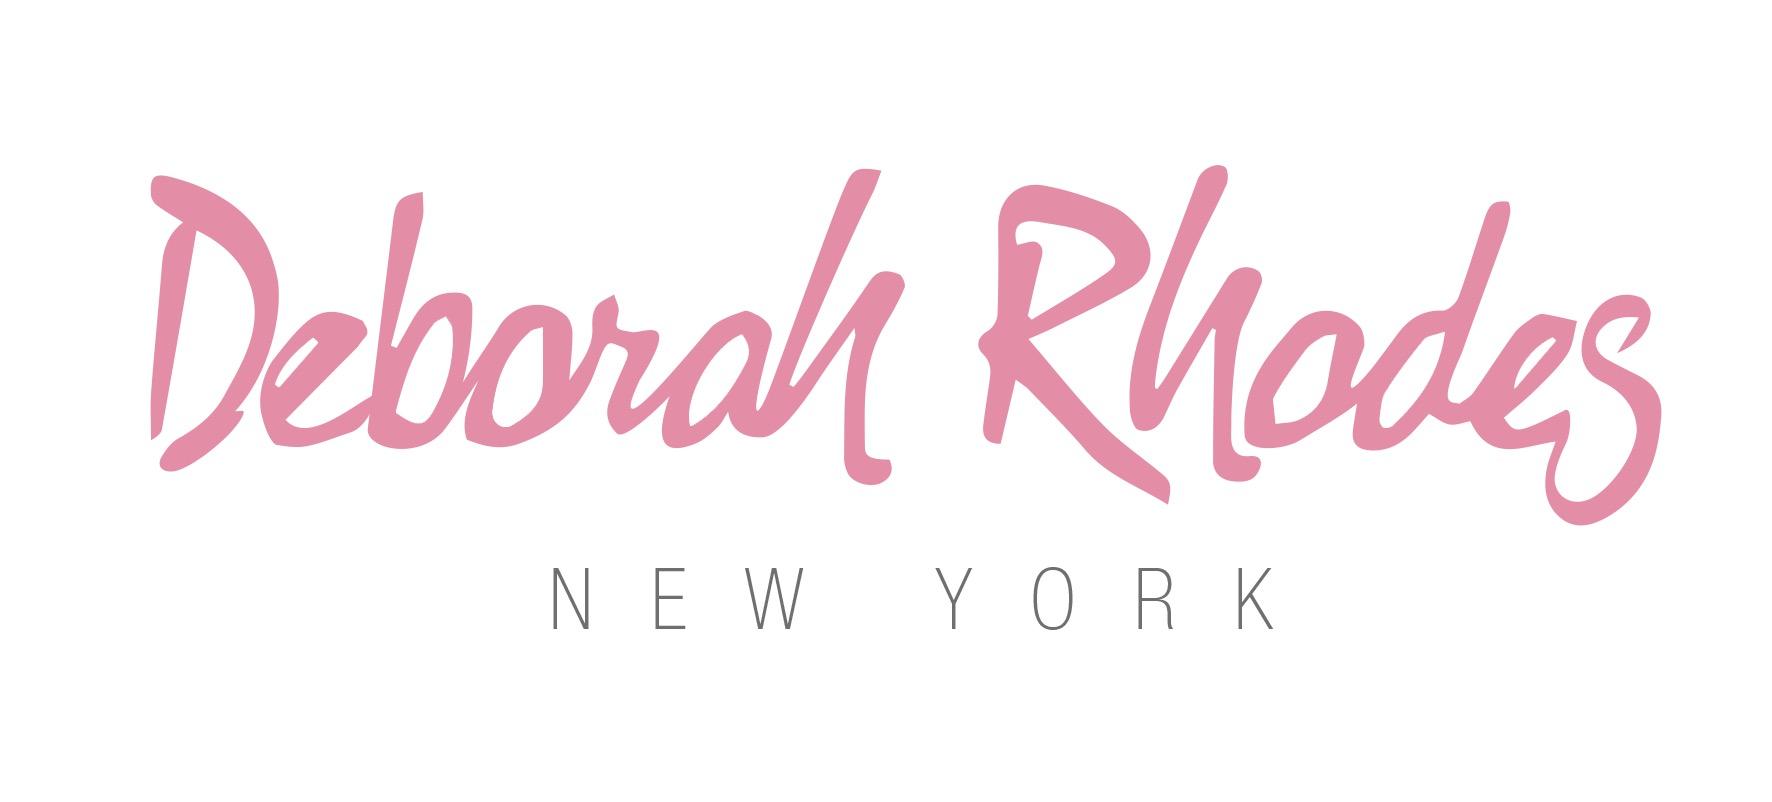 deborah-rhodes-logo.png